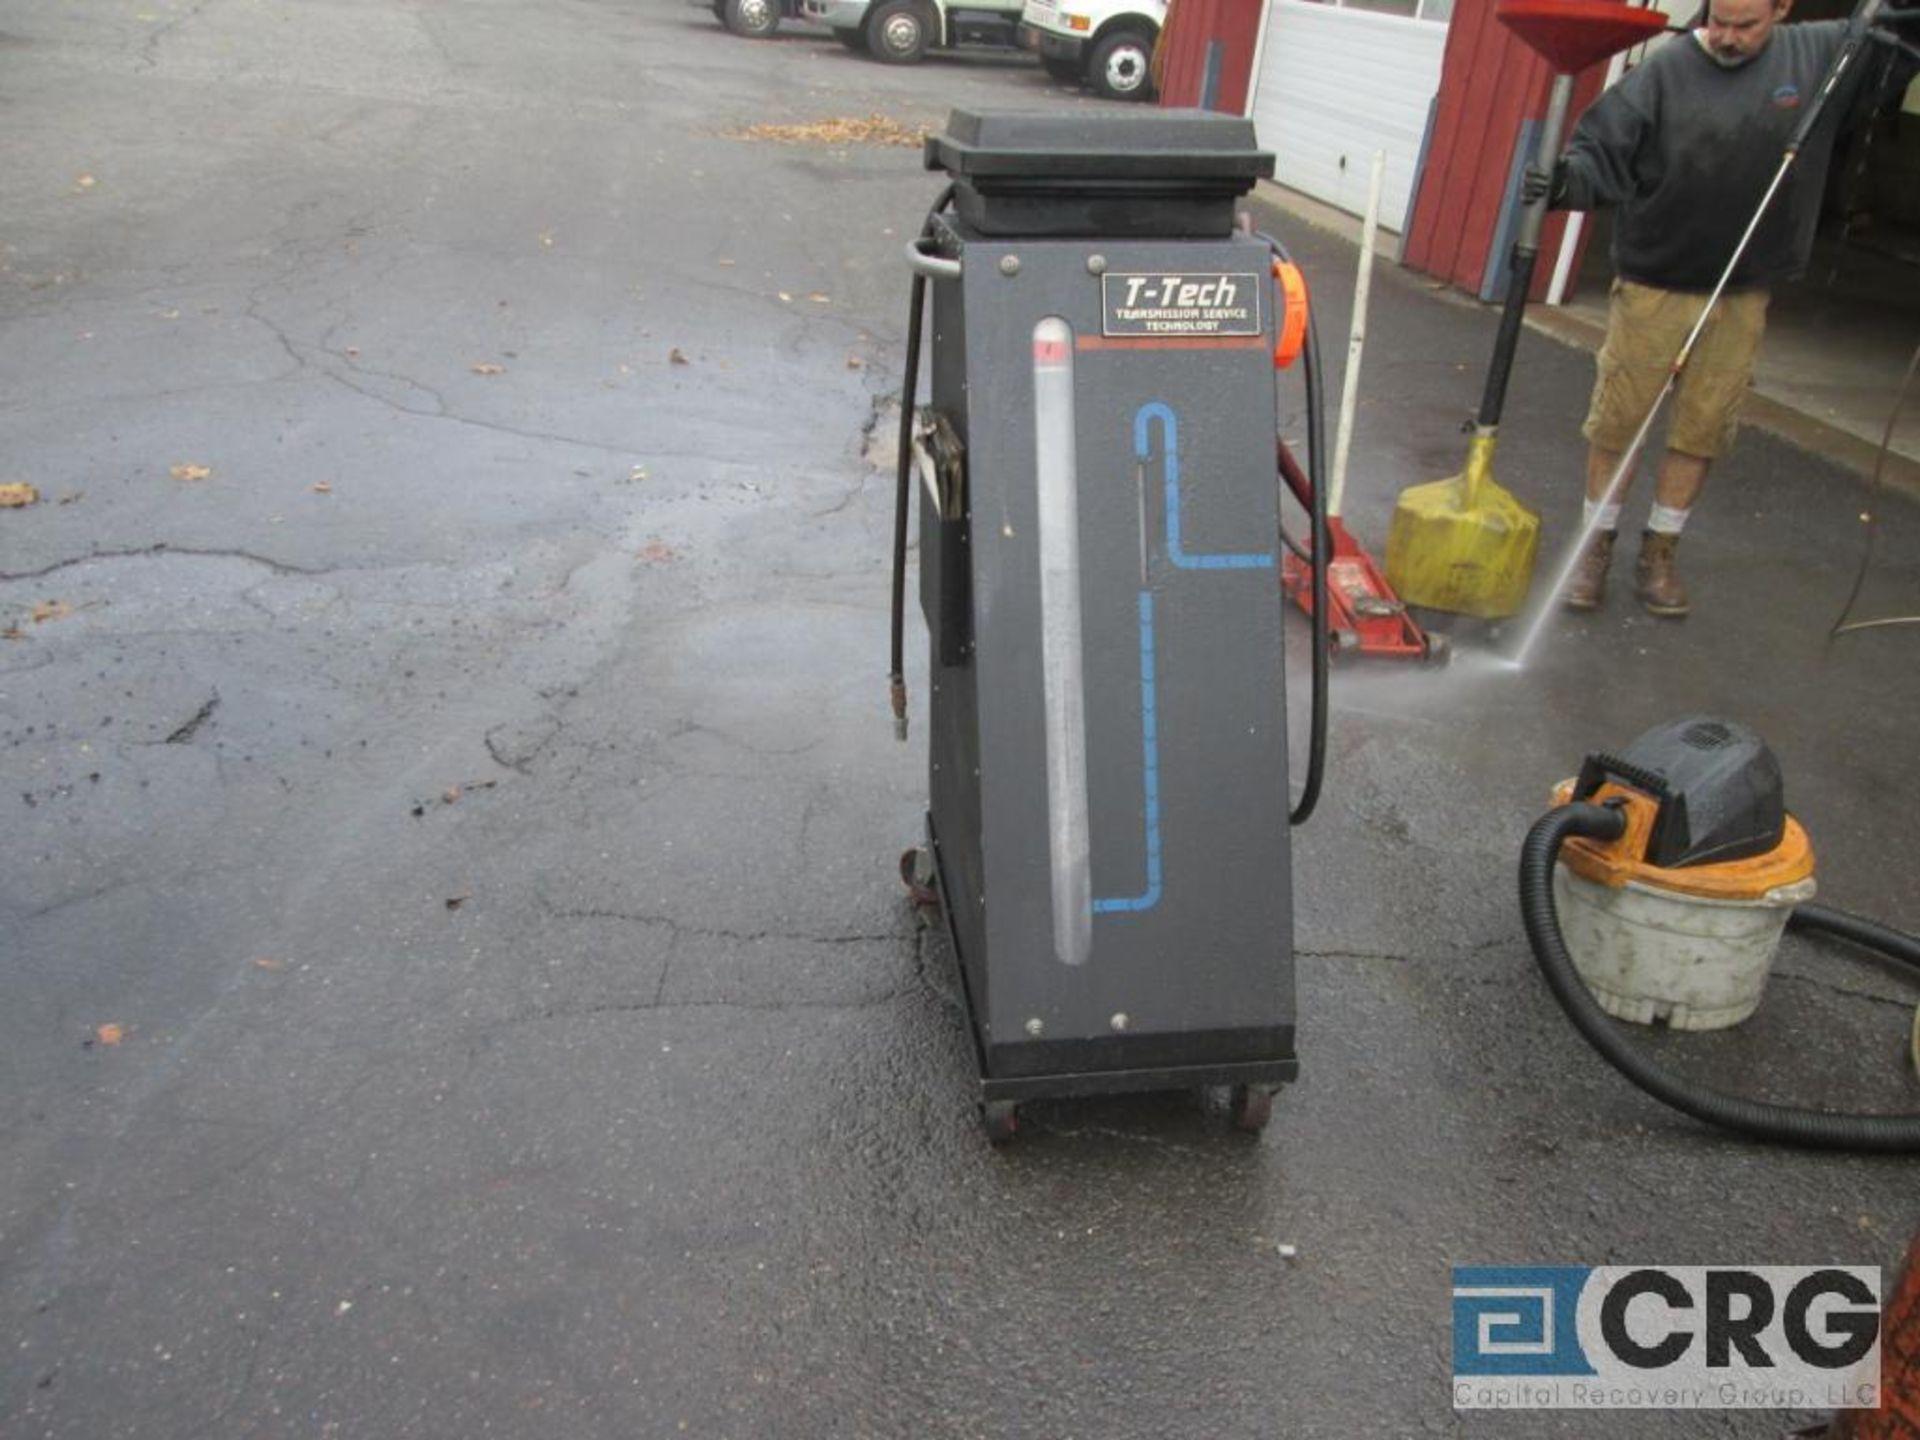 T-Tech Transmission Service Technology transmission flushing machine, portable, 115V, 1 ph - Image 2 of 3